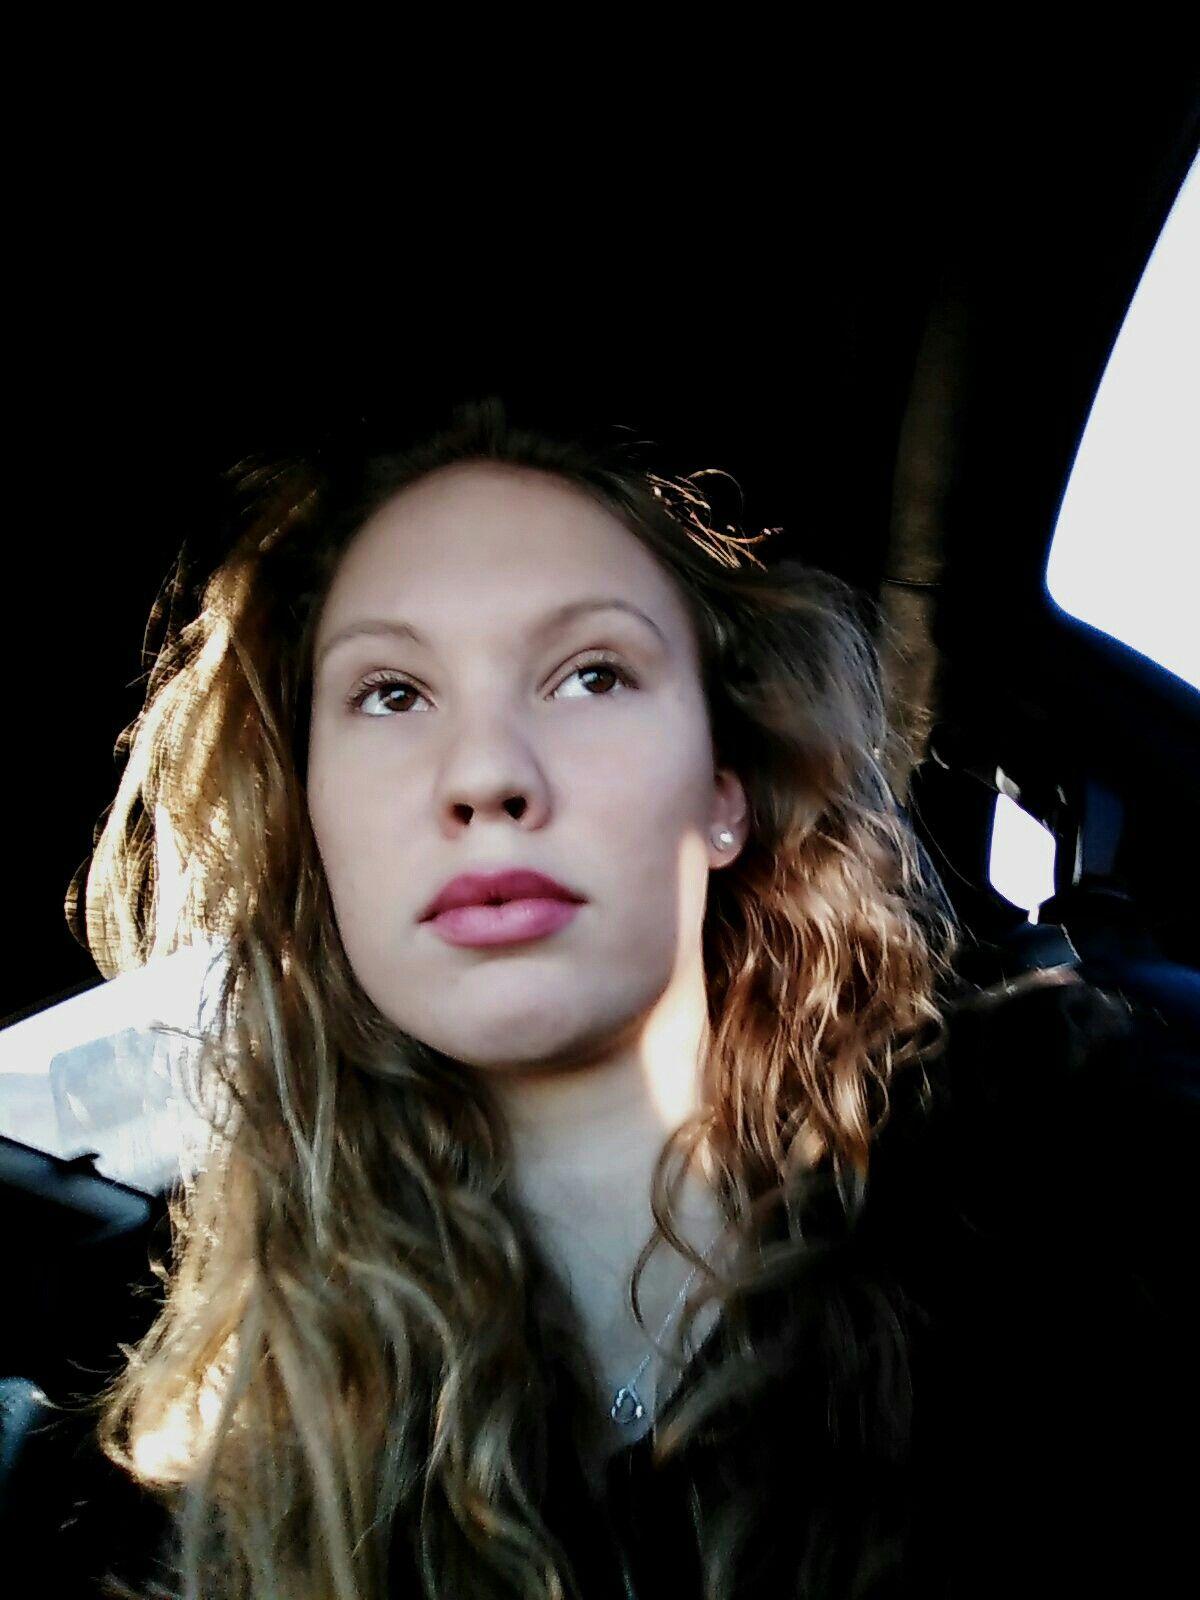 Lip piercing bump outside  Pin by Jessica Holub on Hair  Pinterest